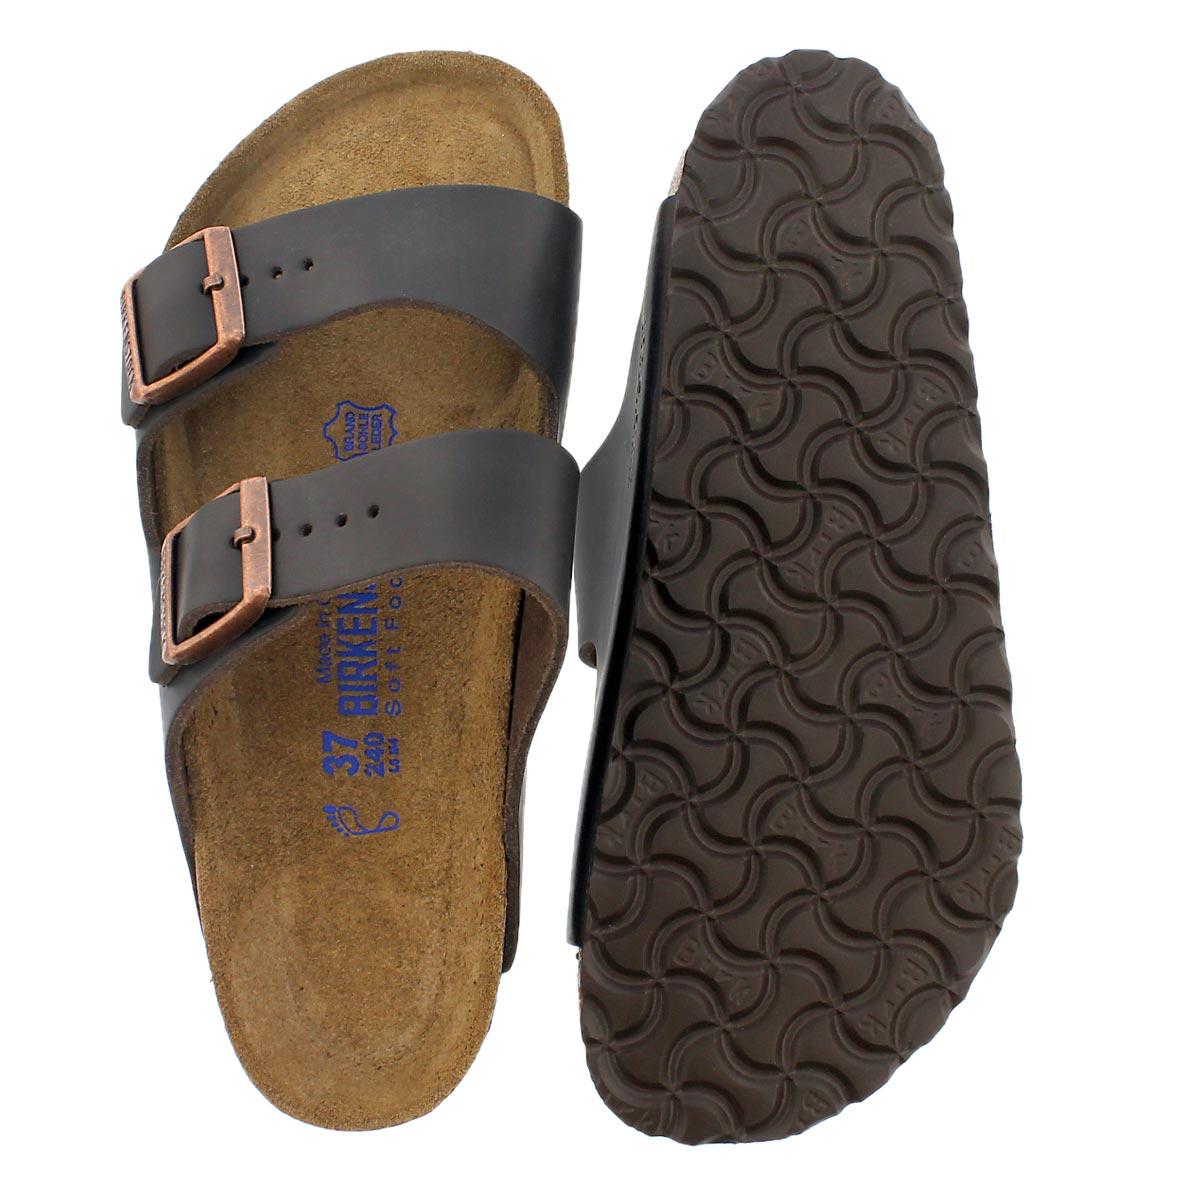 Lds Arizona brown 2 strap lthr sandal SF